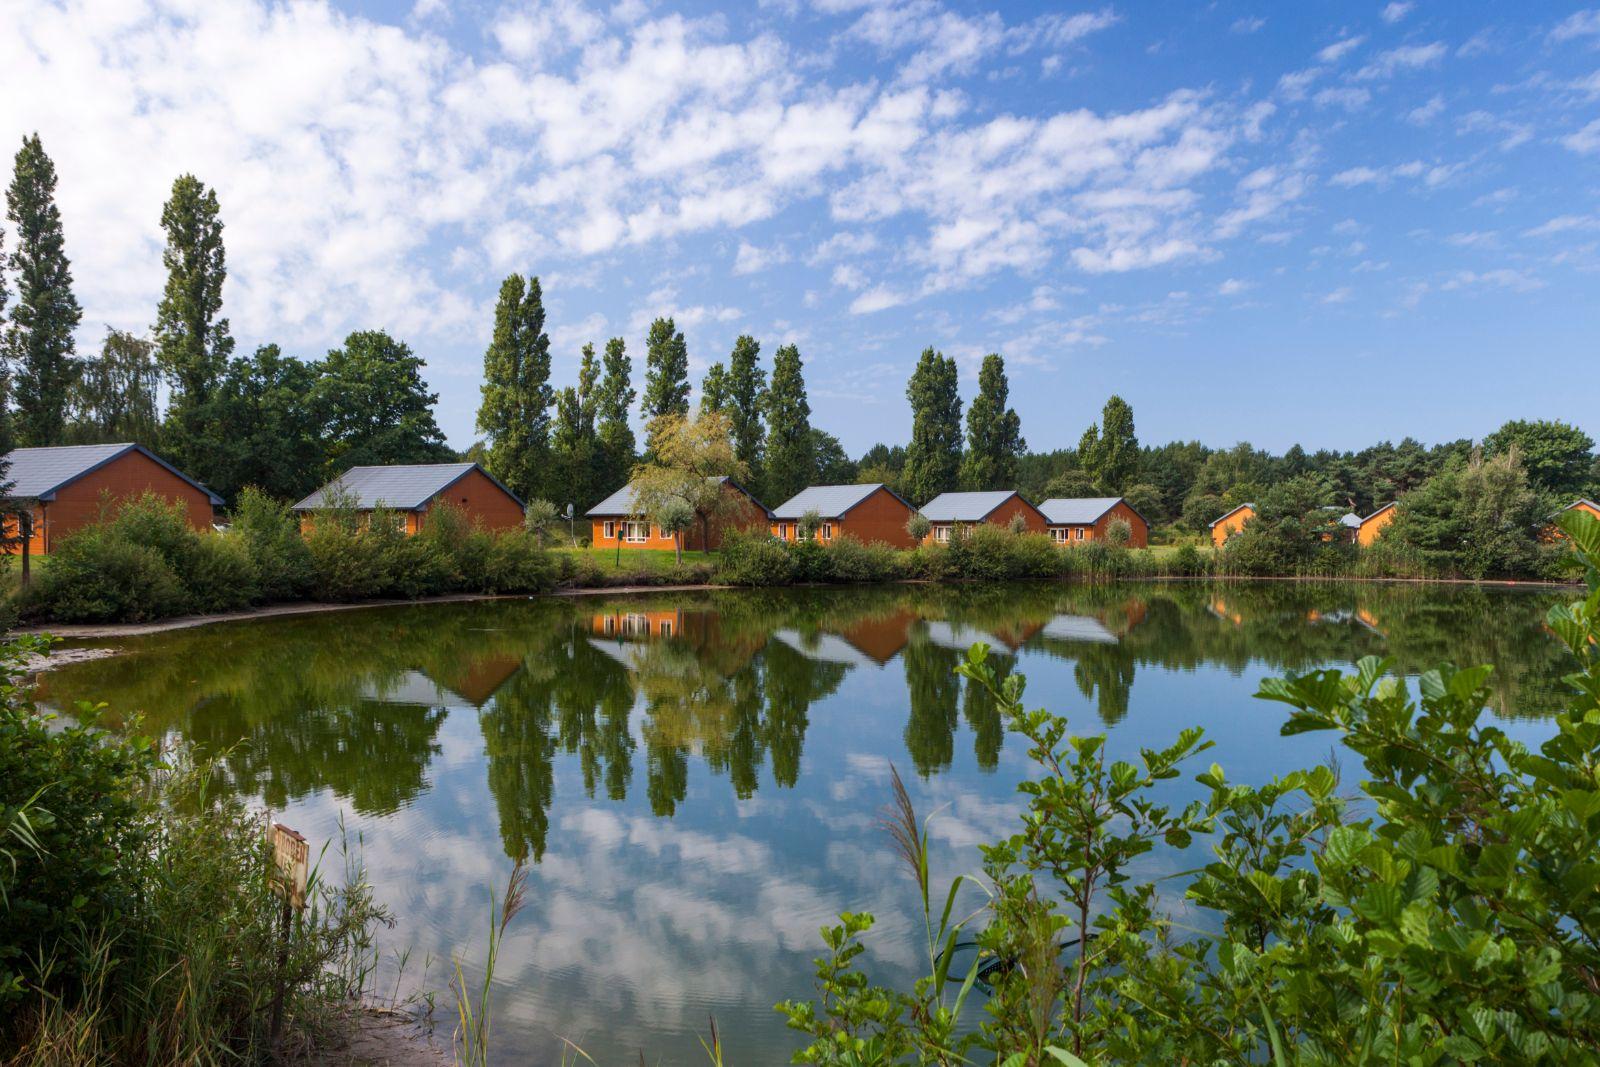 Aanbieding bungalow Limburgse Kempen 🏕️Oostappen park Parelstrand